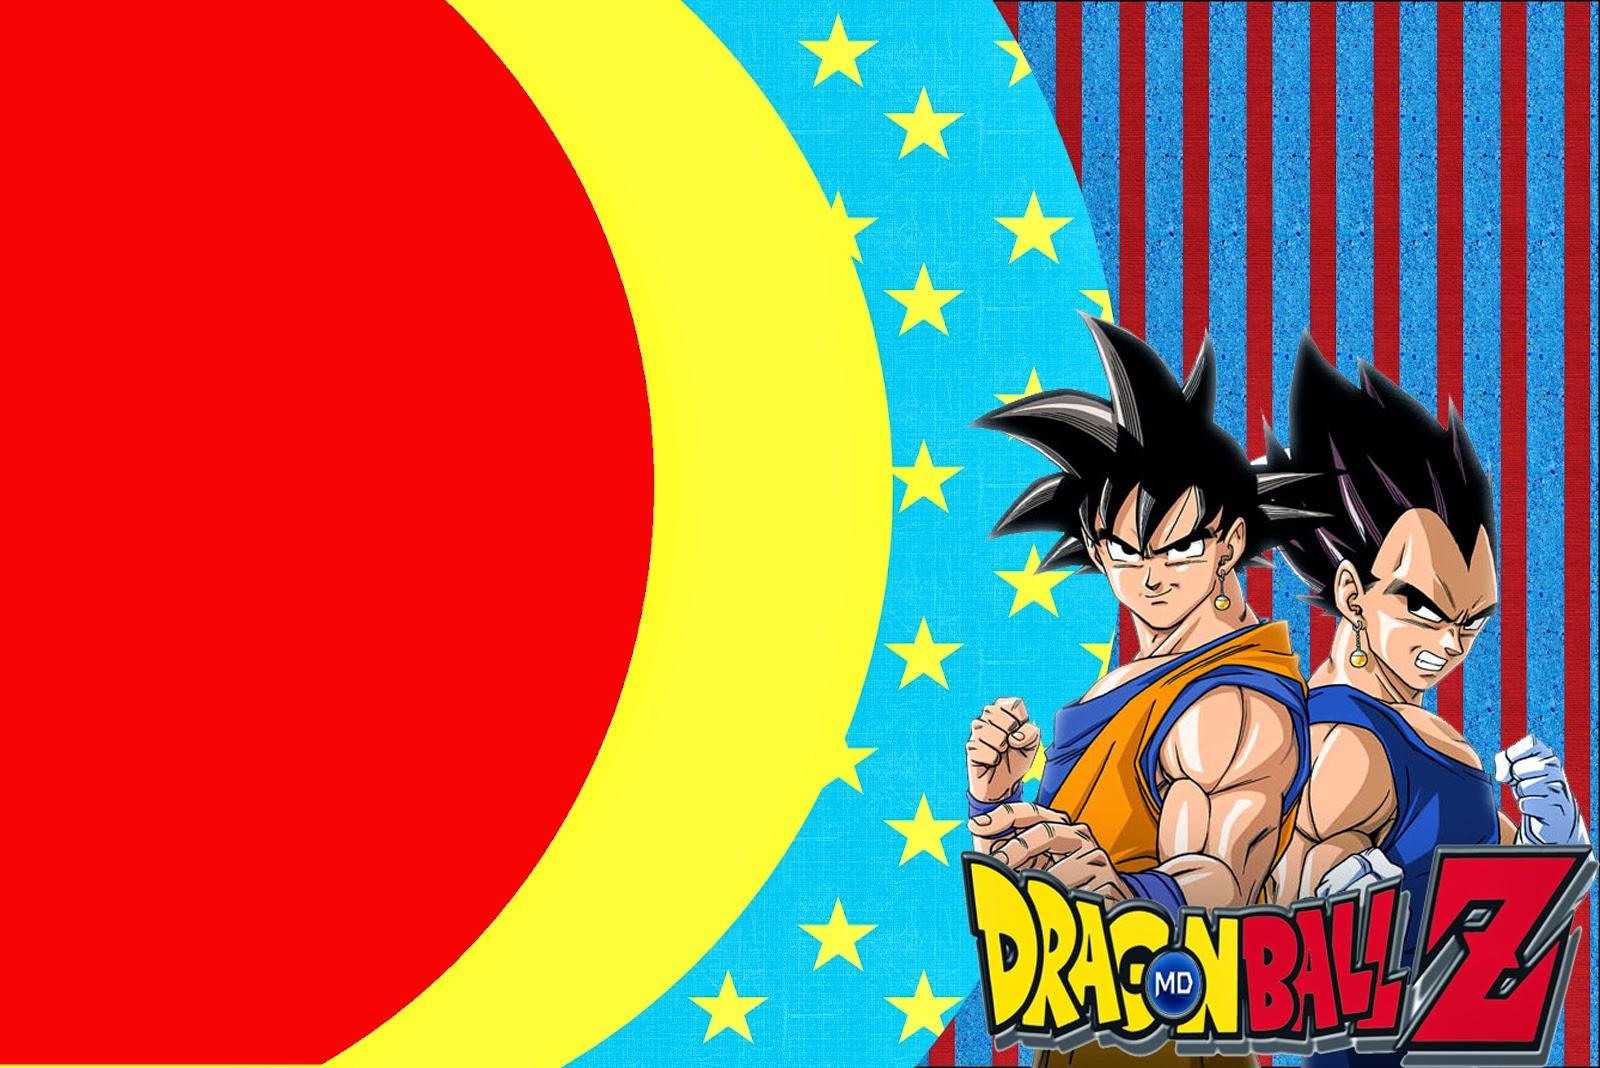 Dragon Ball Z Free Printable Invitations Oh My Fiesta